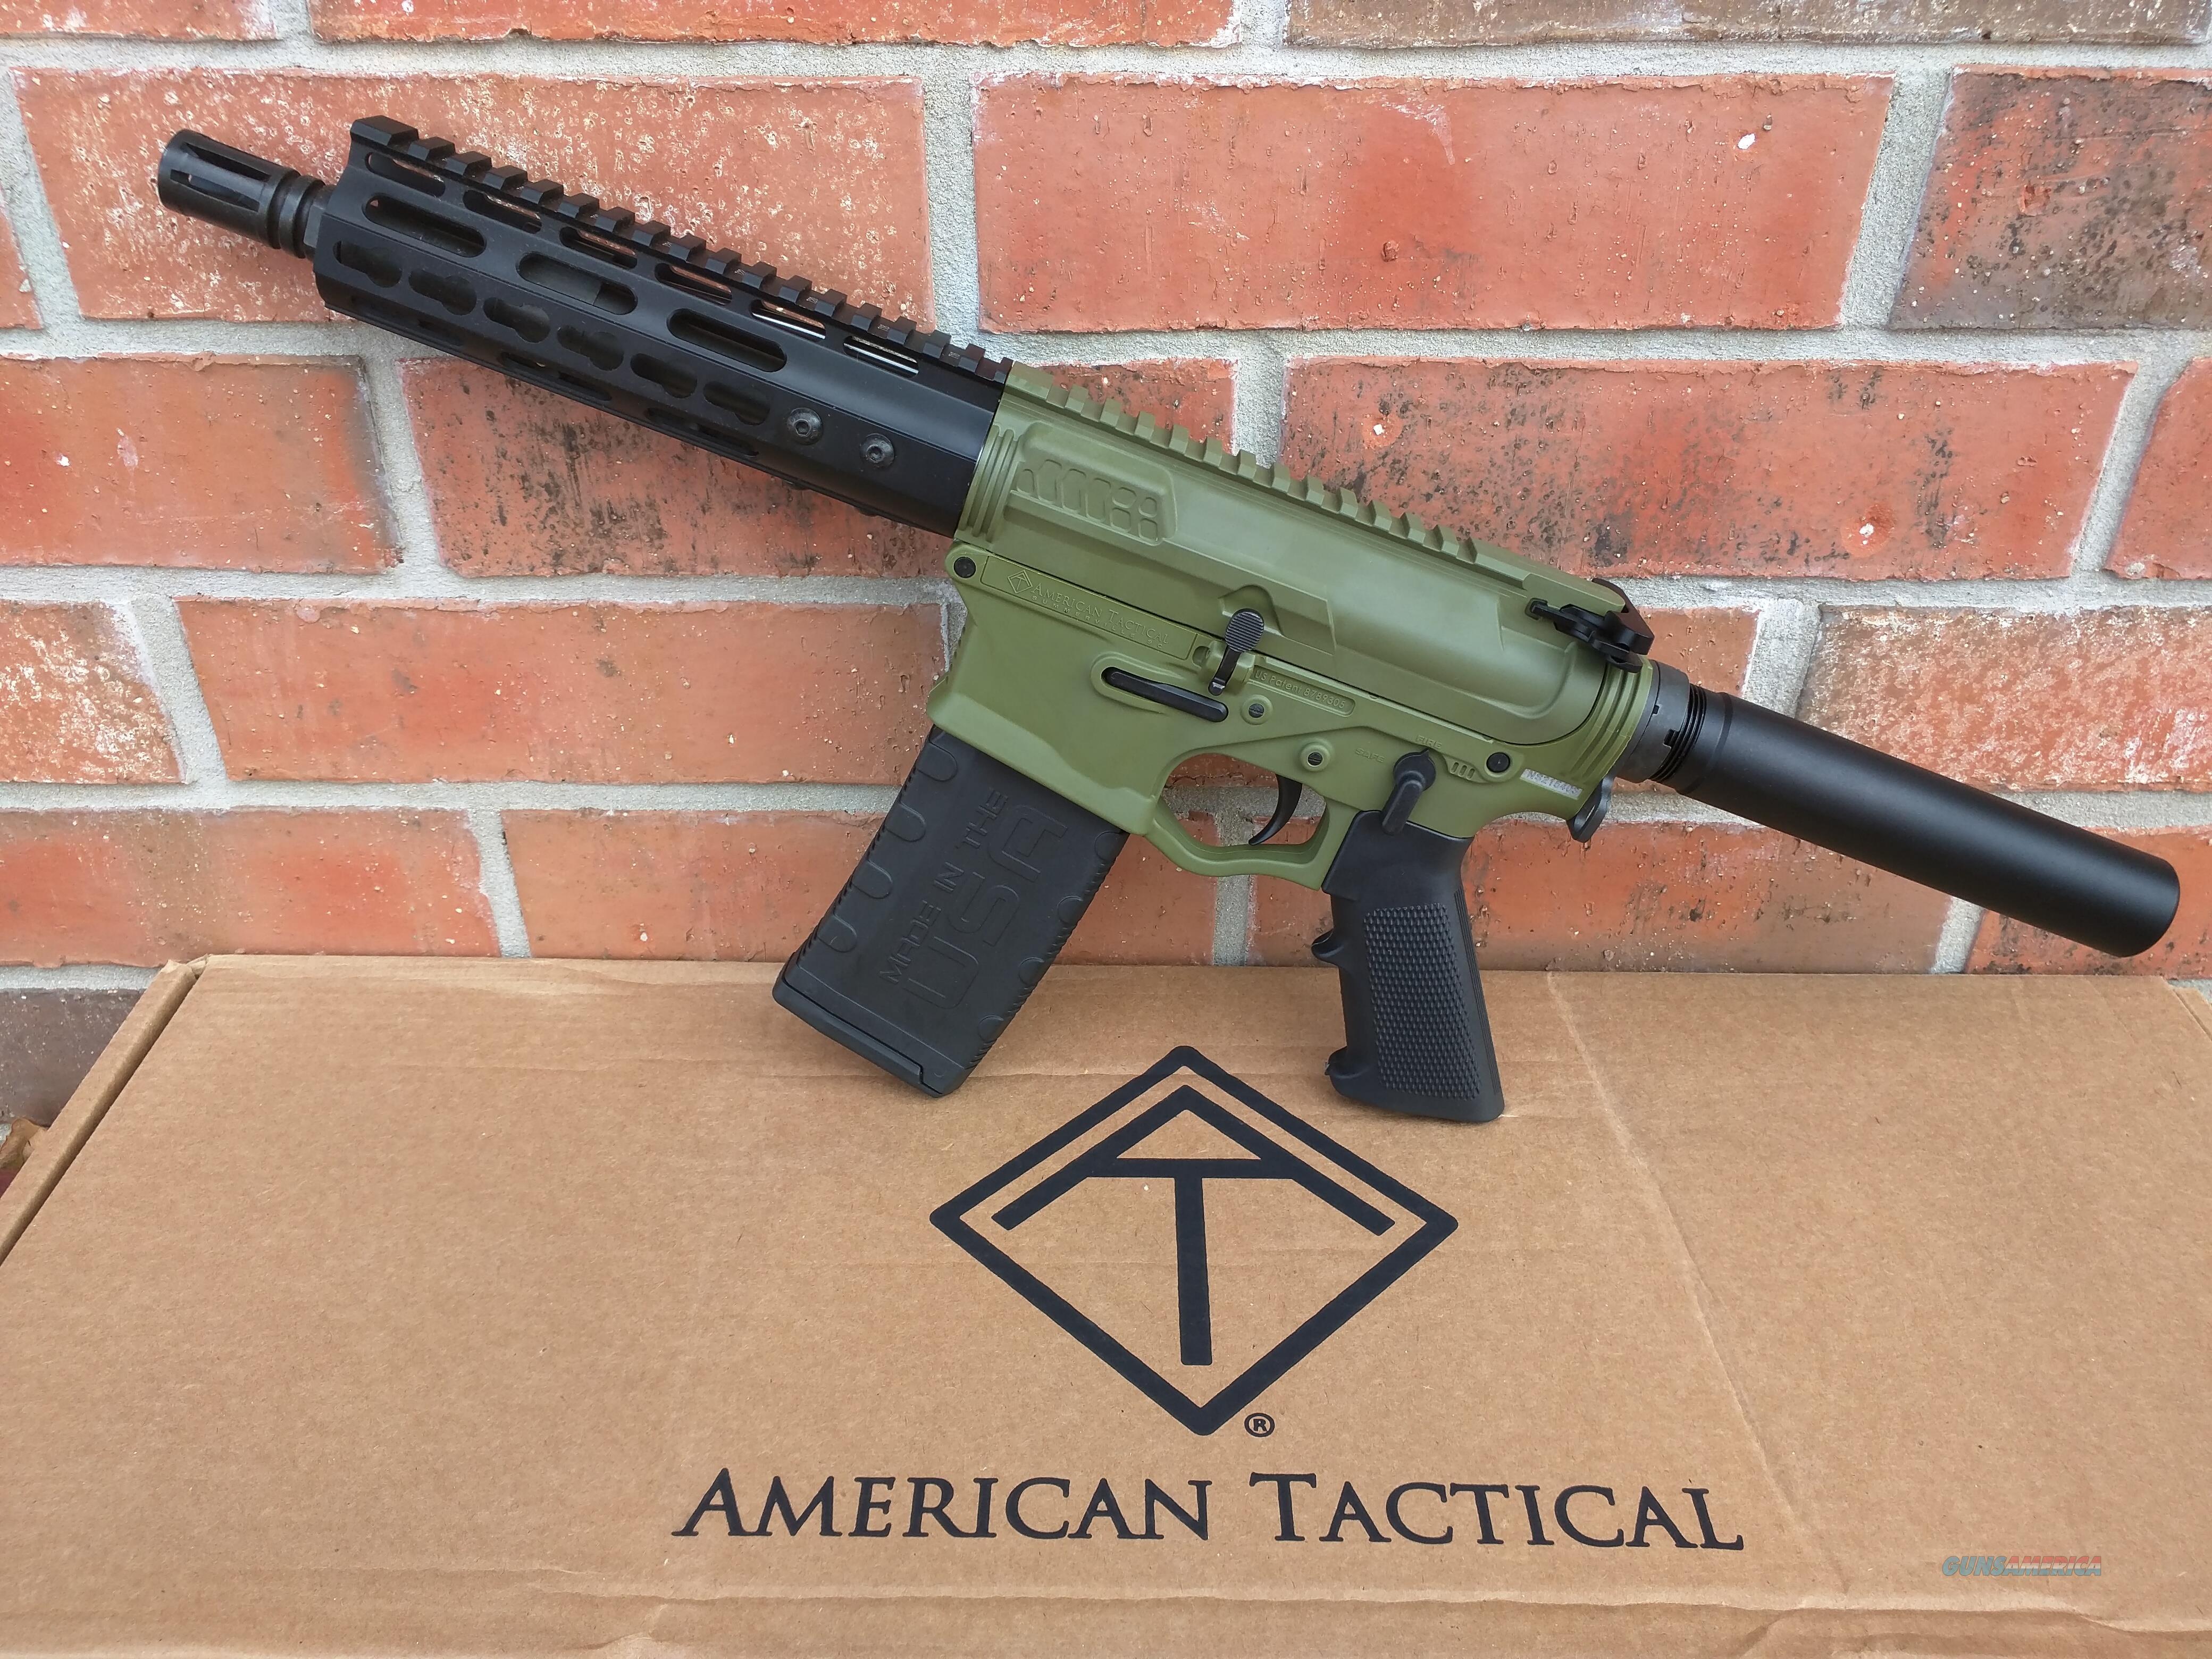 "ATI AR 15 AR15 Pistol American Tactical Omni Maxx Hybrid Battlefield Green 5.56/223 7.5"" Barrel, Aluminum Hand Guard (1) 30 Rd Mag NIB Lightweight Corrosion Resistant FREE LAYAWAY  Guns > Rifles > AR-15 Rifles - Small Manufacturers > Complete Rifle"